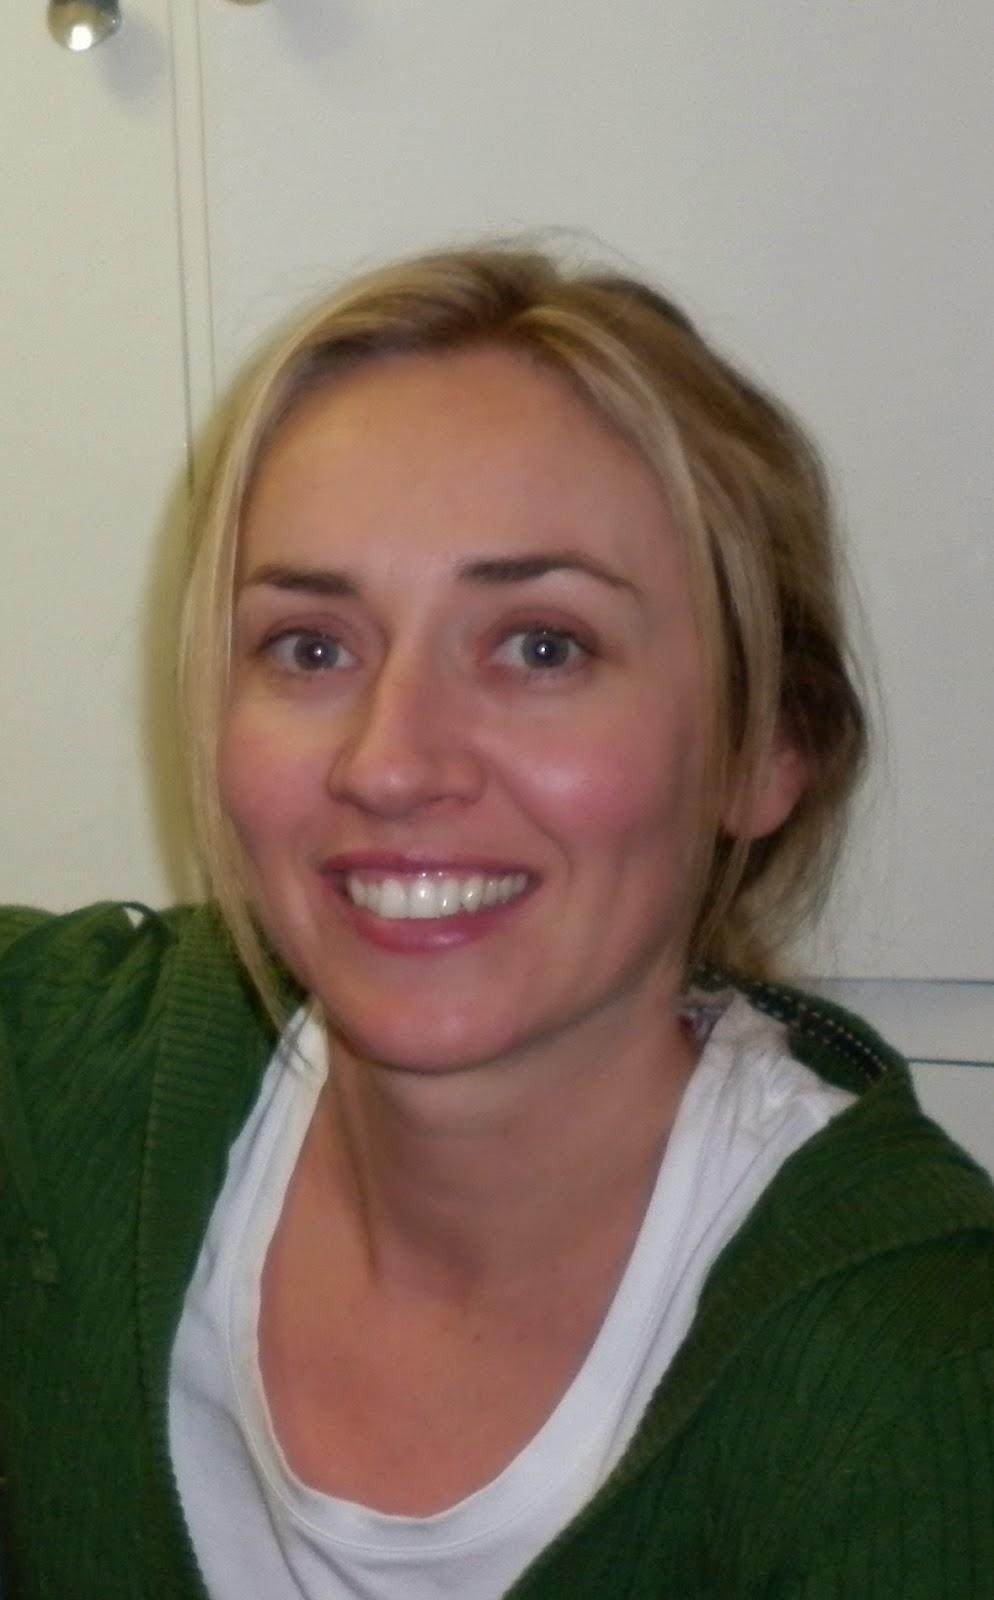 Libby Jones Podiatry | doctor | 221 Kincaid St, Wagga Wagga NSW 2650, Australia | 0269213390 OR +61 2 6921 3390